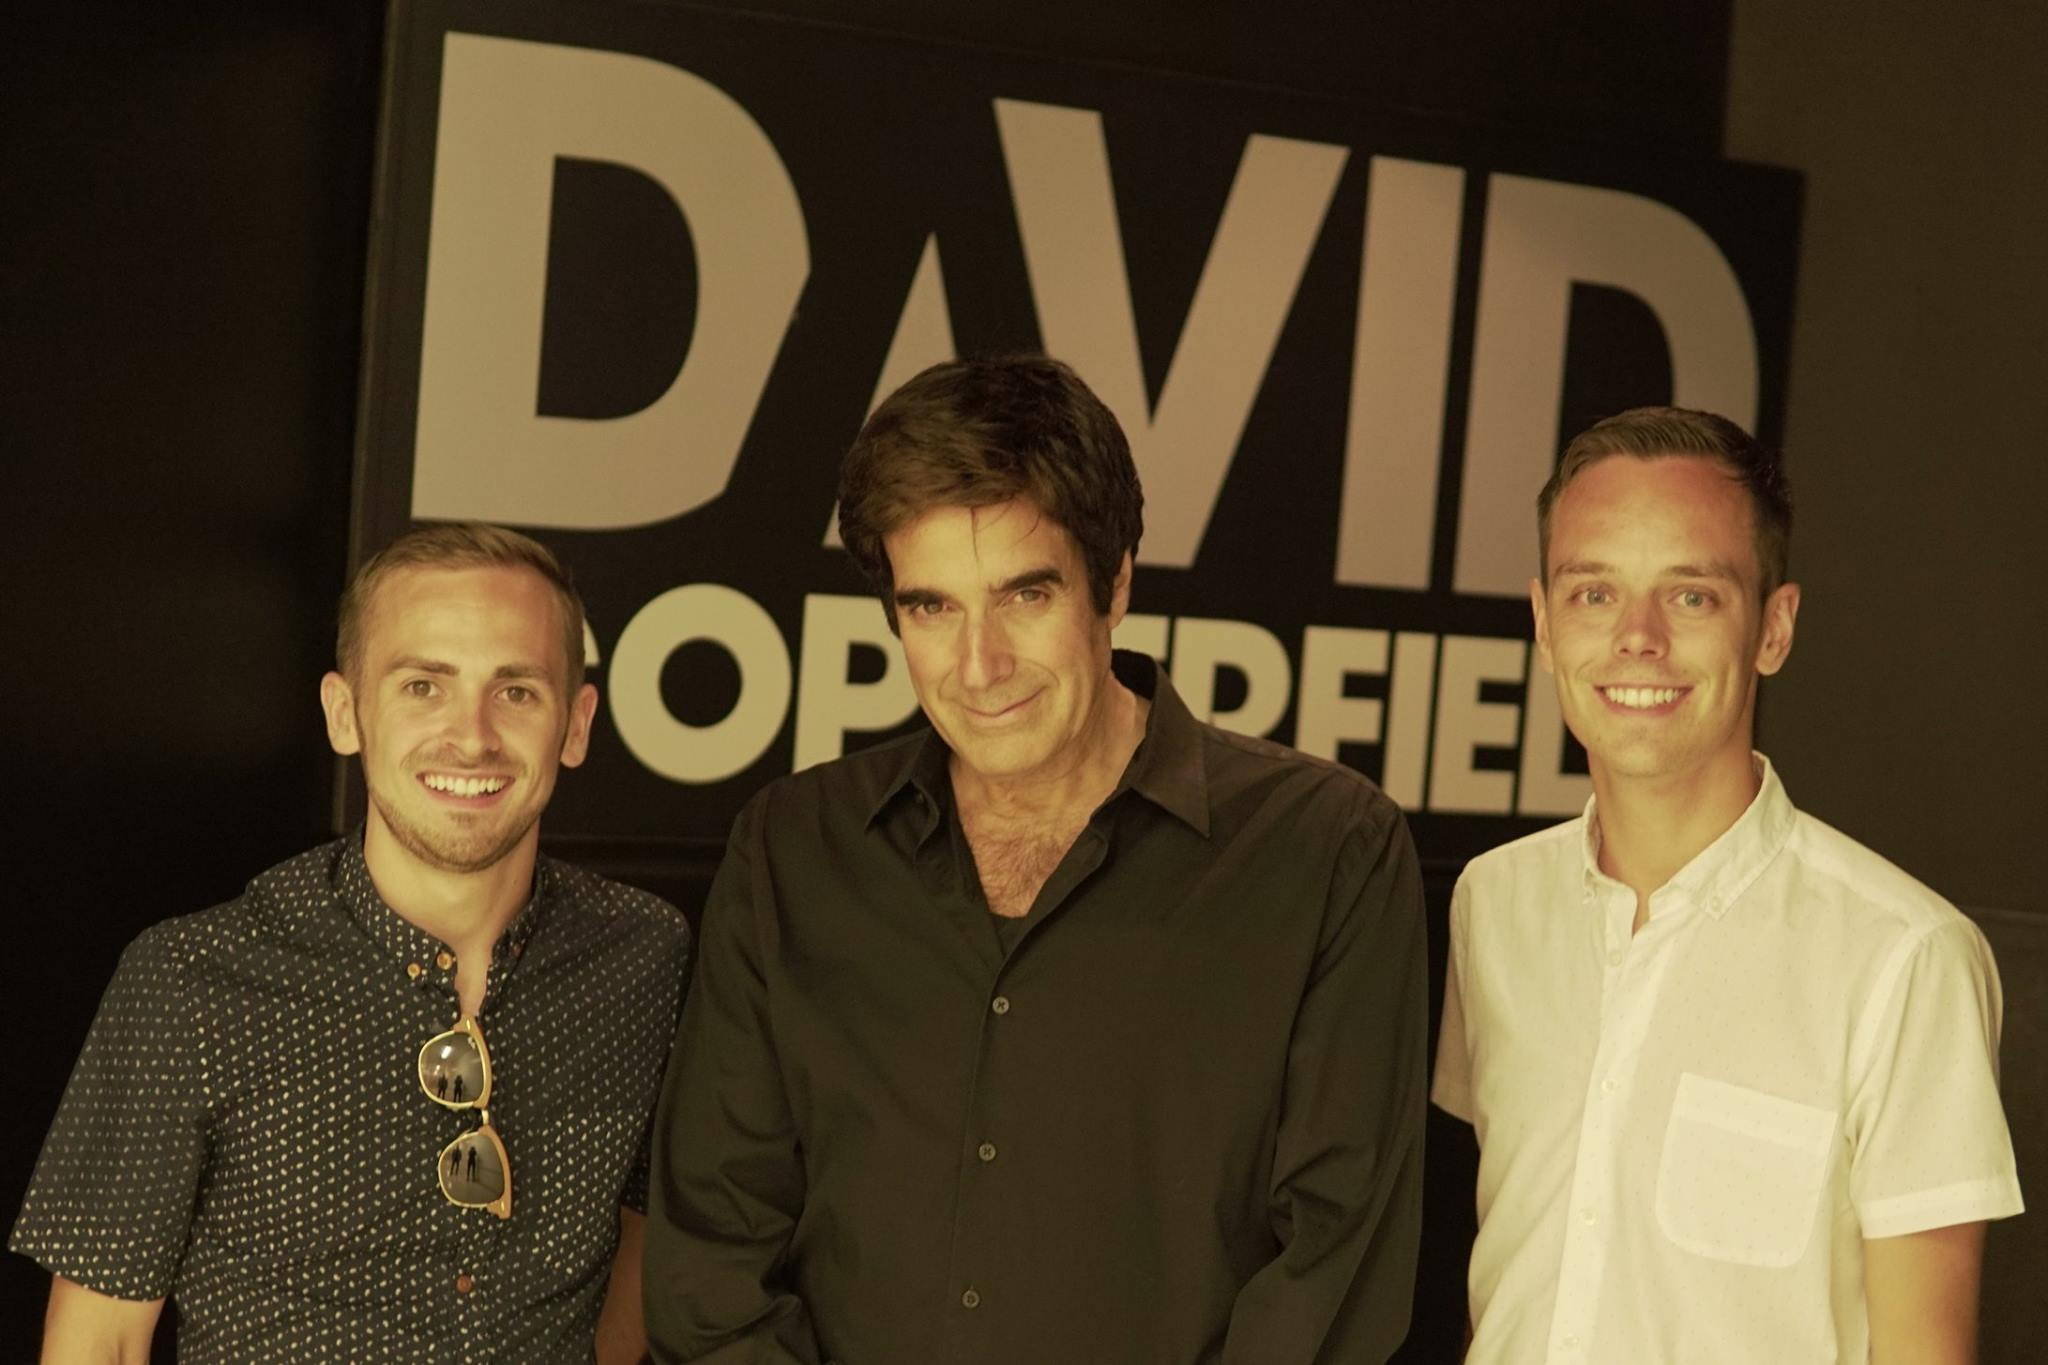 Jay & Joss with David Copperfield